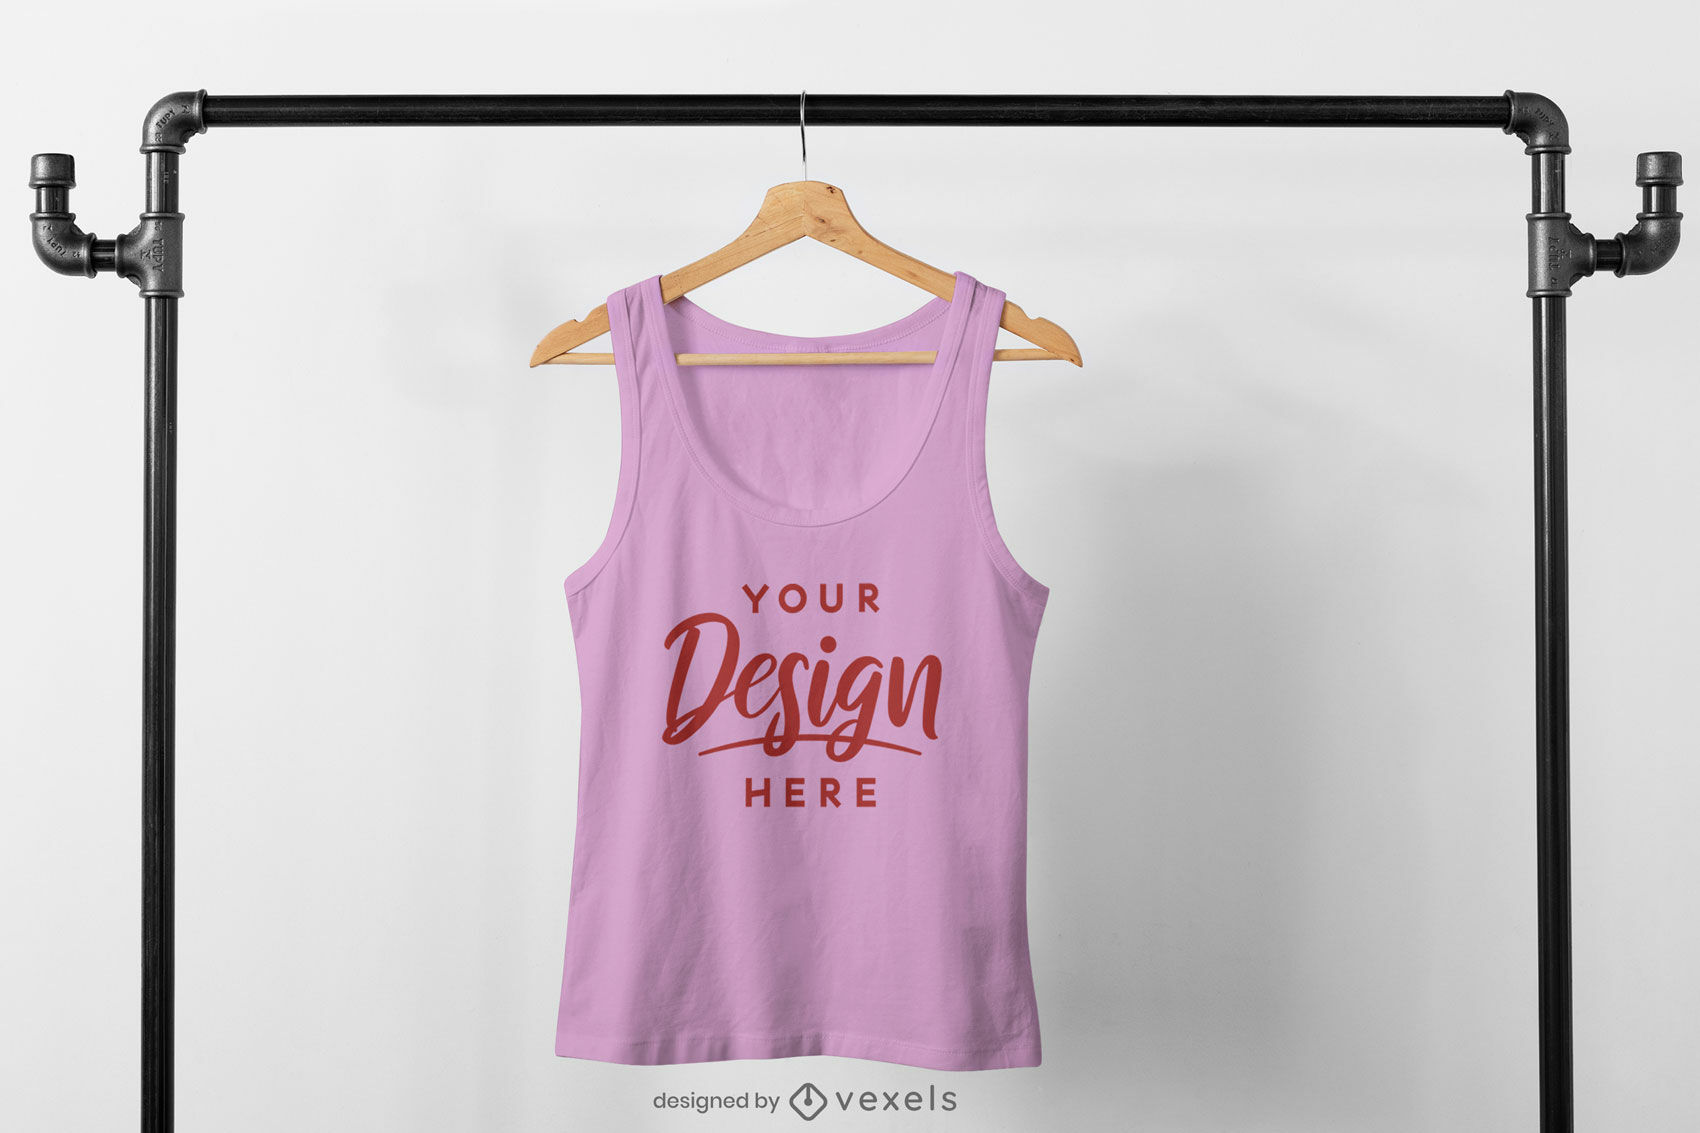 Camiseta sin mangas en maqueta de rack